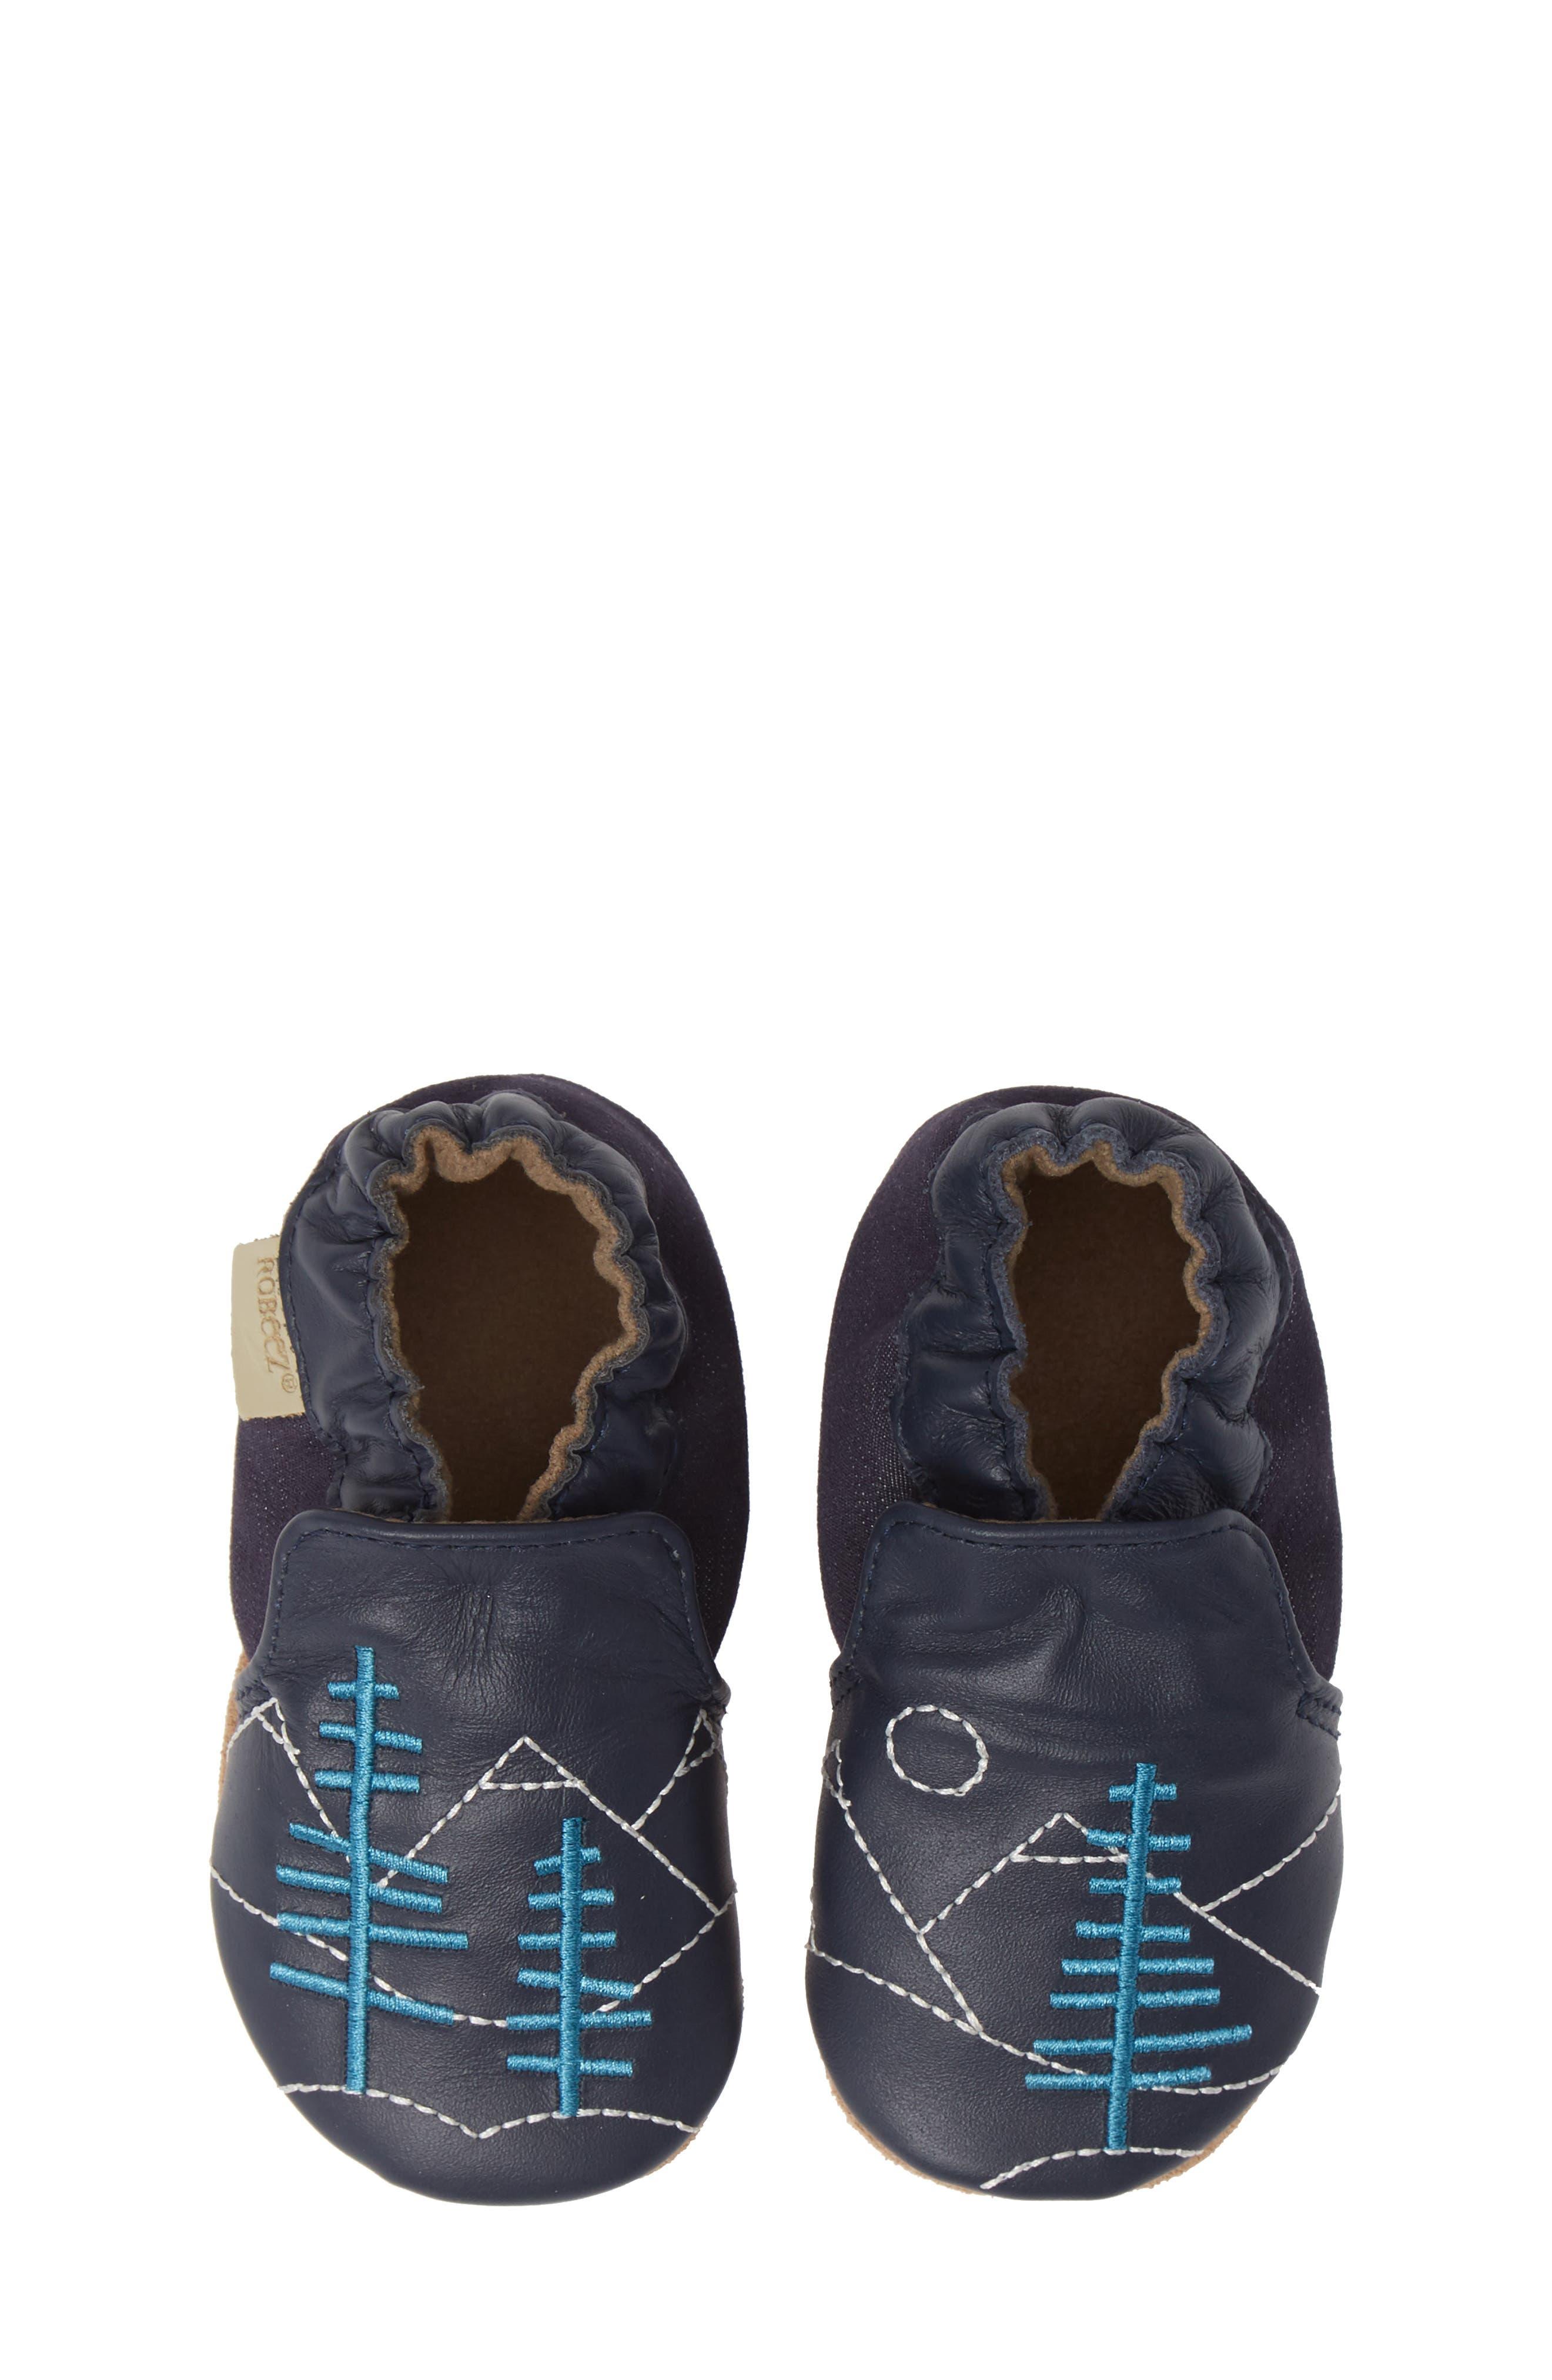 ROBEEZ<SUP>®</SUP> Mountain Explorer Moccasin Crib Shoe, Main, color, NAVY